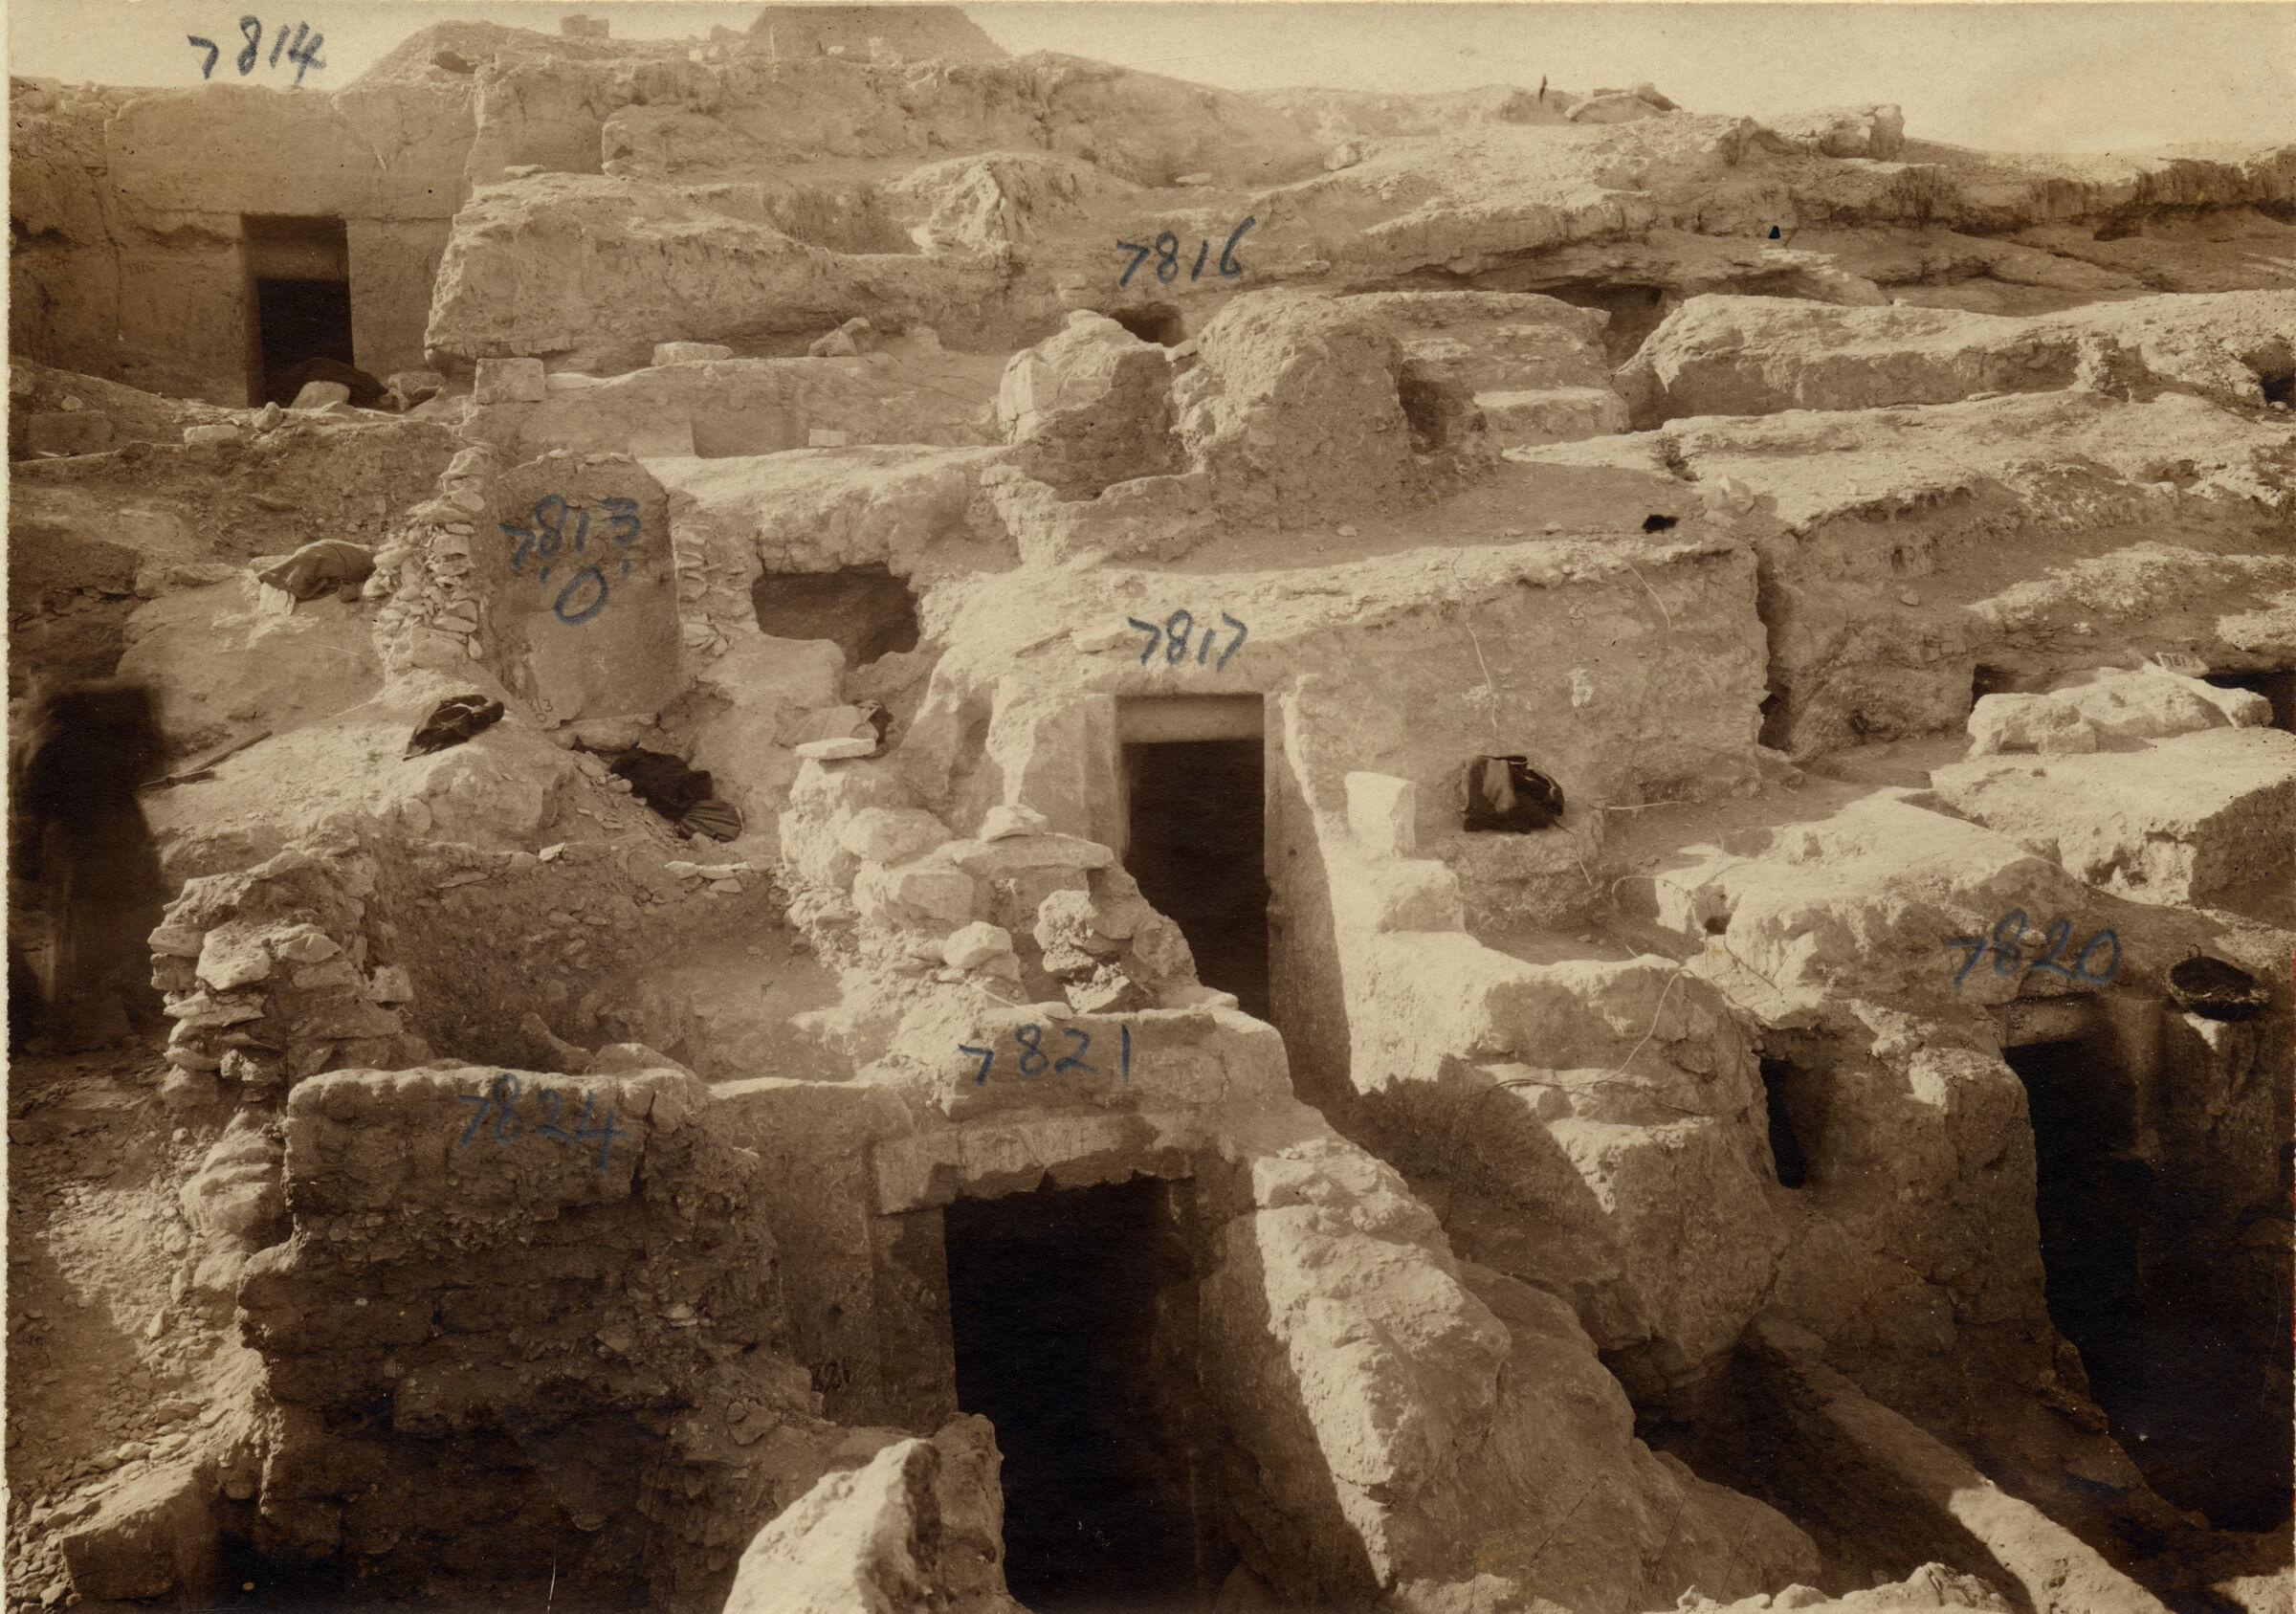 Eastern Cemetery: Site: Giza; View: G 7824, G 7821, G 7820, G 7817, G 7813, G 7816, G 7814